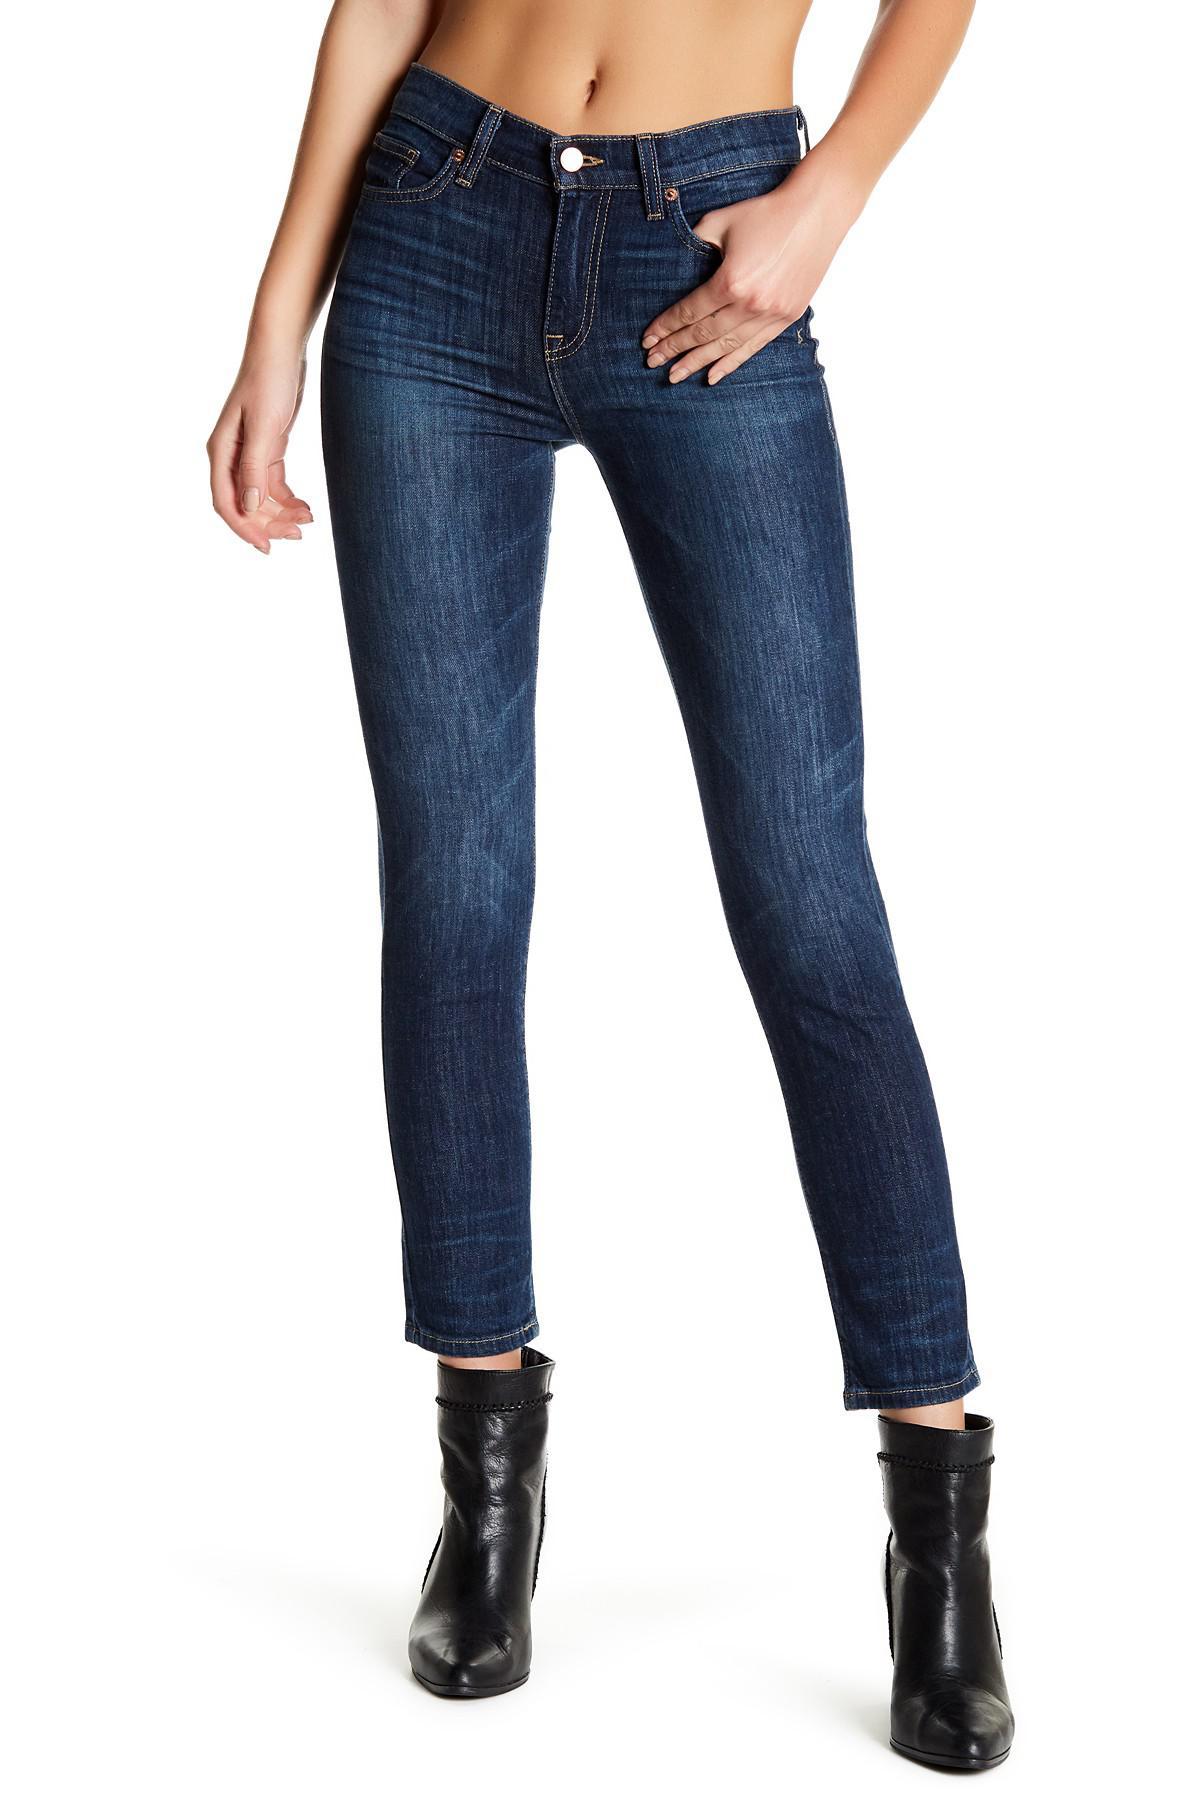 7da26075 Lyst - Genetic Denim Birkin High Waist Jean in Blue